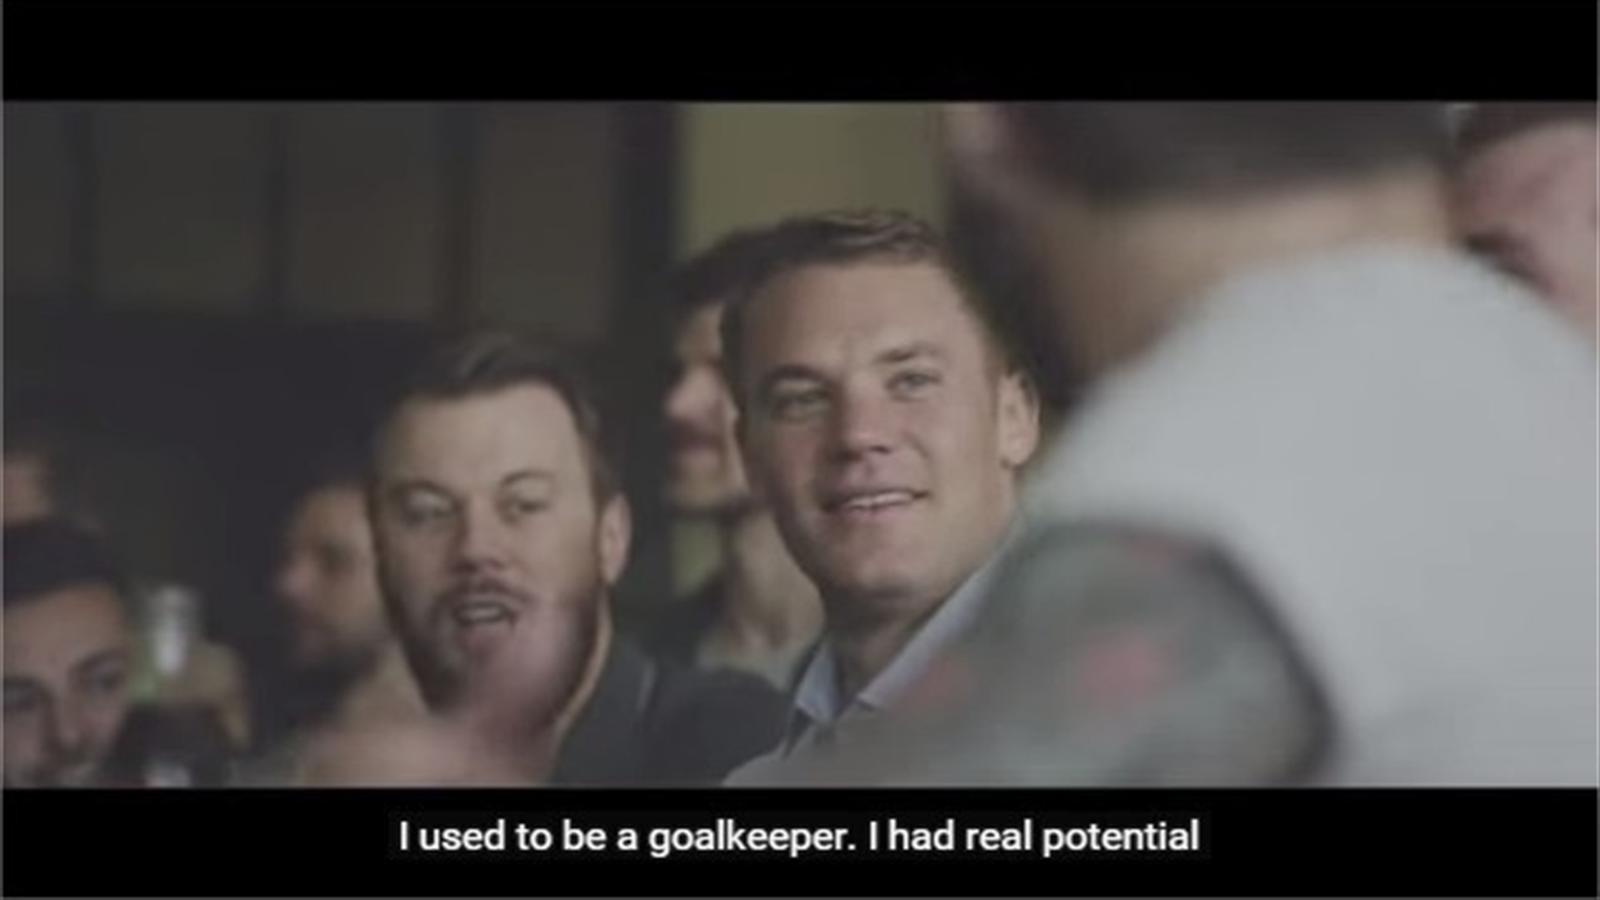 Bayern Munich and Germany goalkeeper Manuel Neuer in a Coke Zero advert